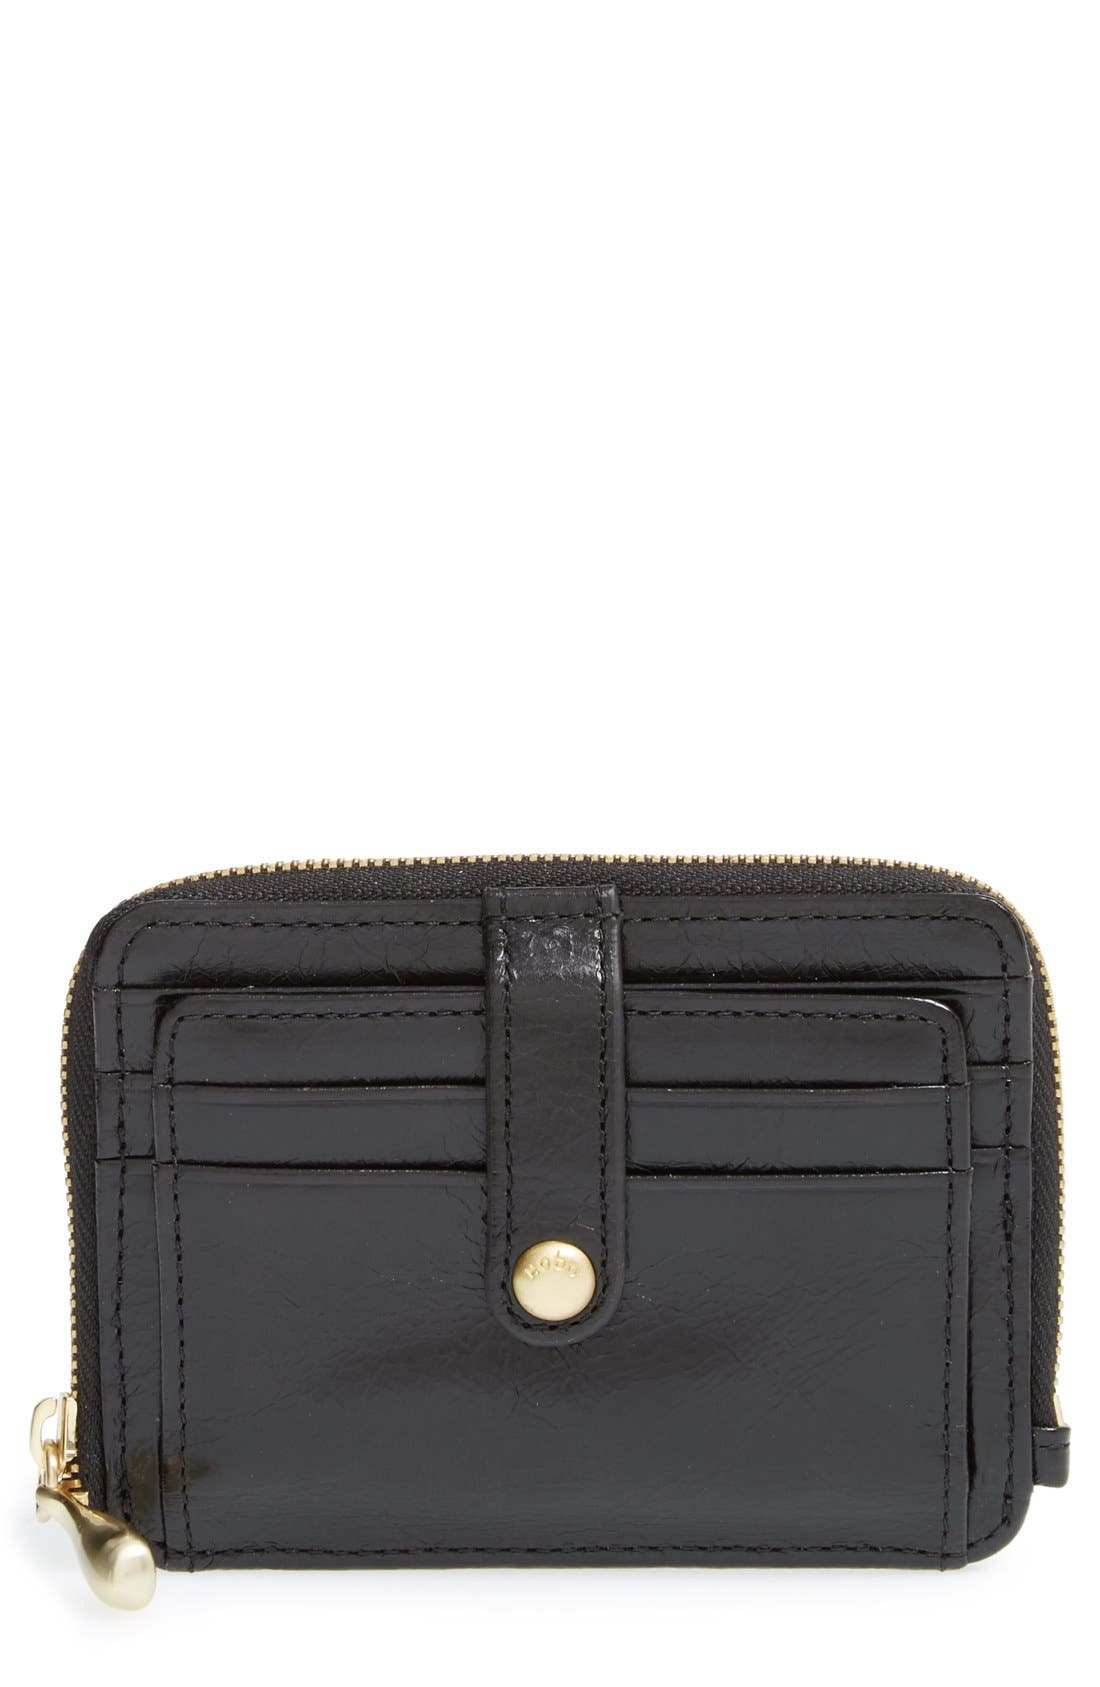 'Katya' Leather Wallet,                             Main thumbnail 1, color,                             Black